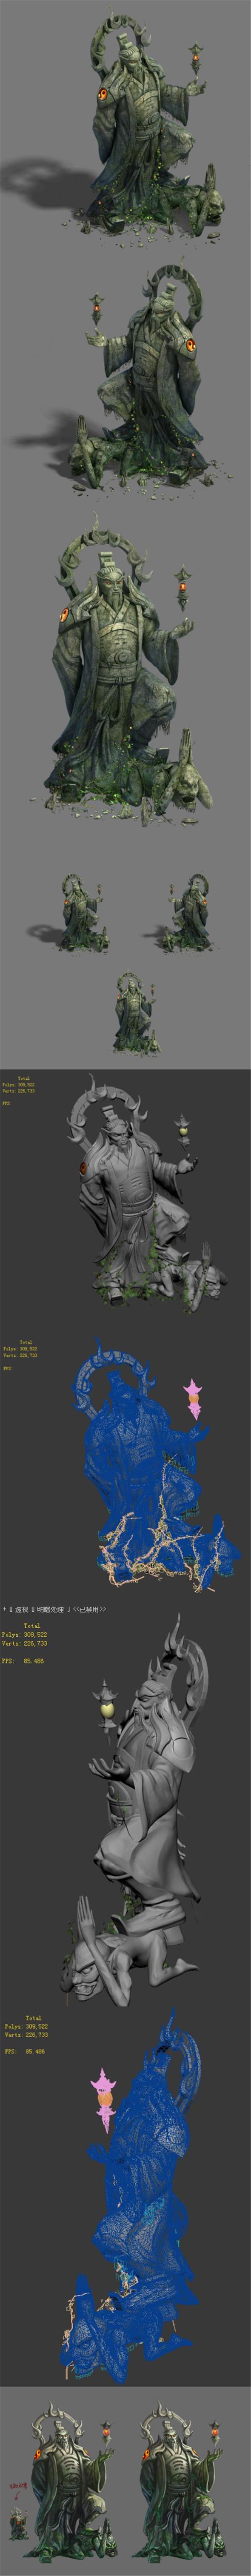 Shushan - statue - 3DOcean Item for Sale